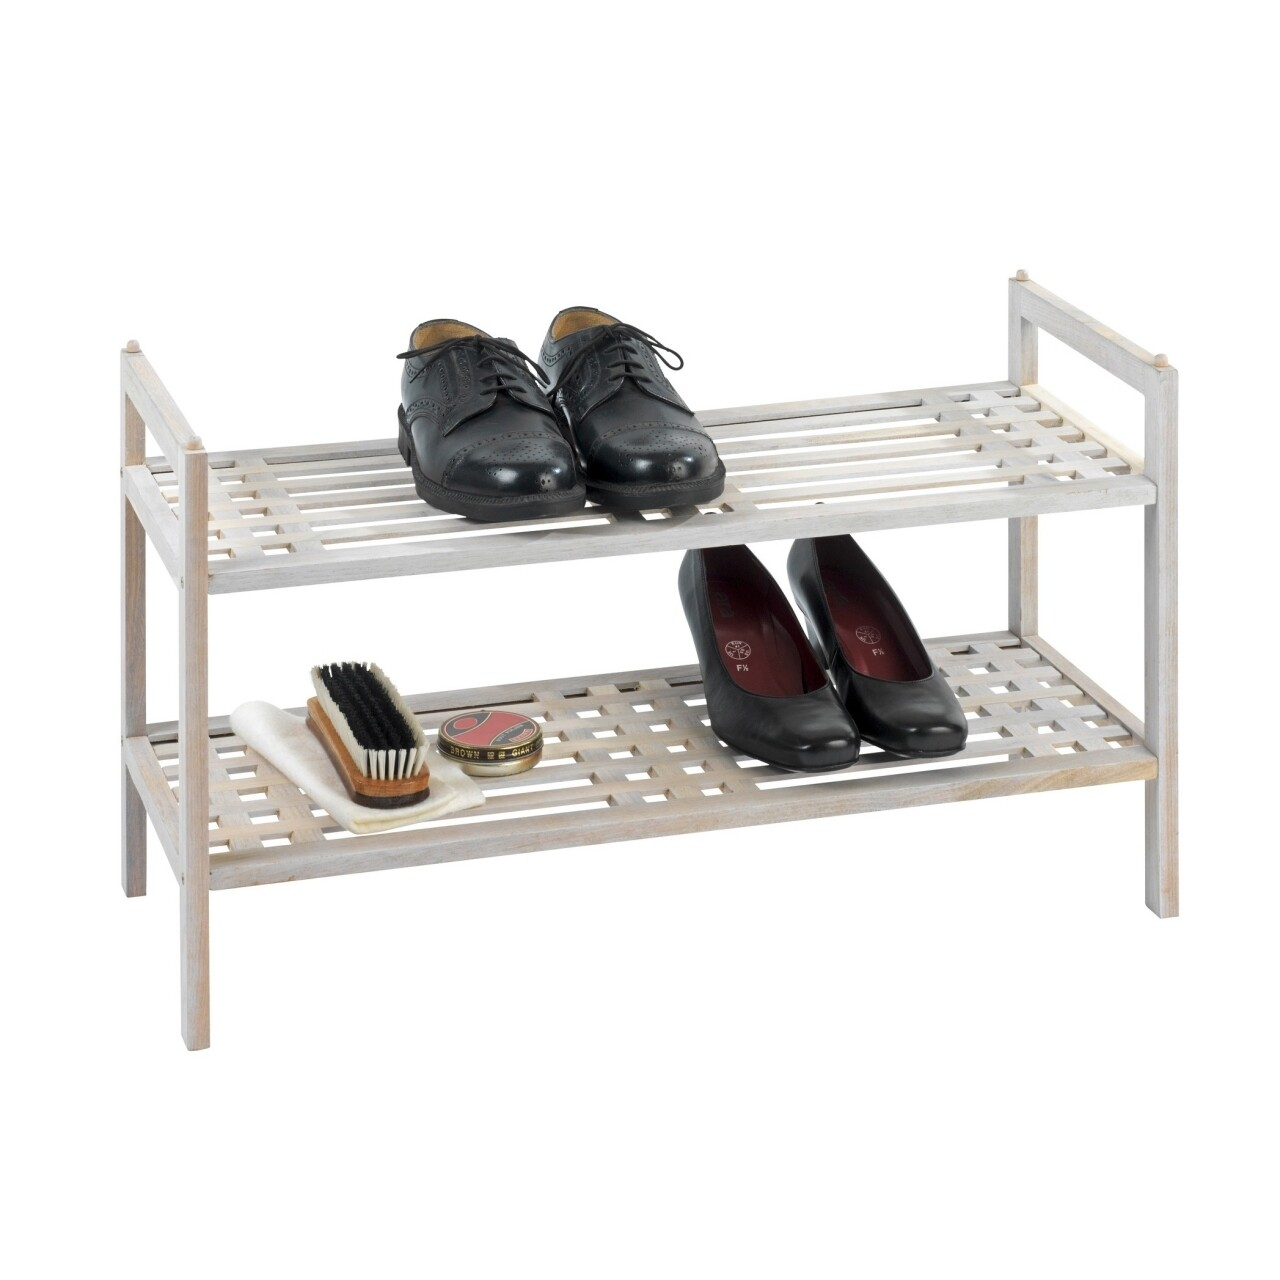 Suport pantofi Norway White, Wenko, 6 perechi, 60x40.5x27 cm,  lemn de nuc, natur